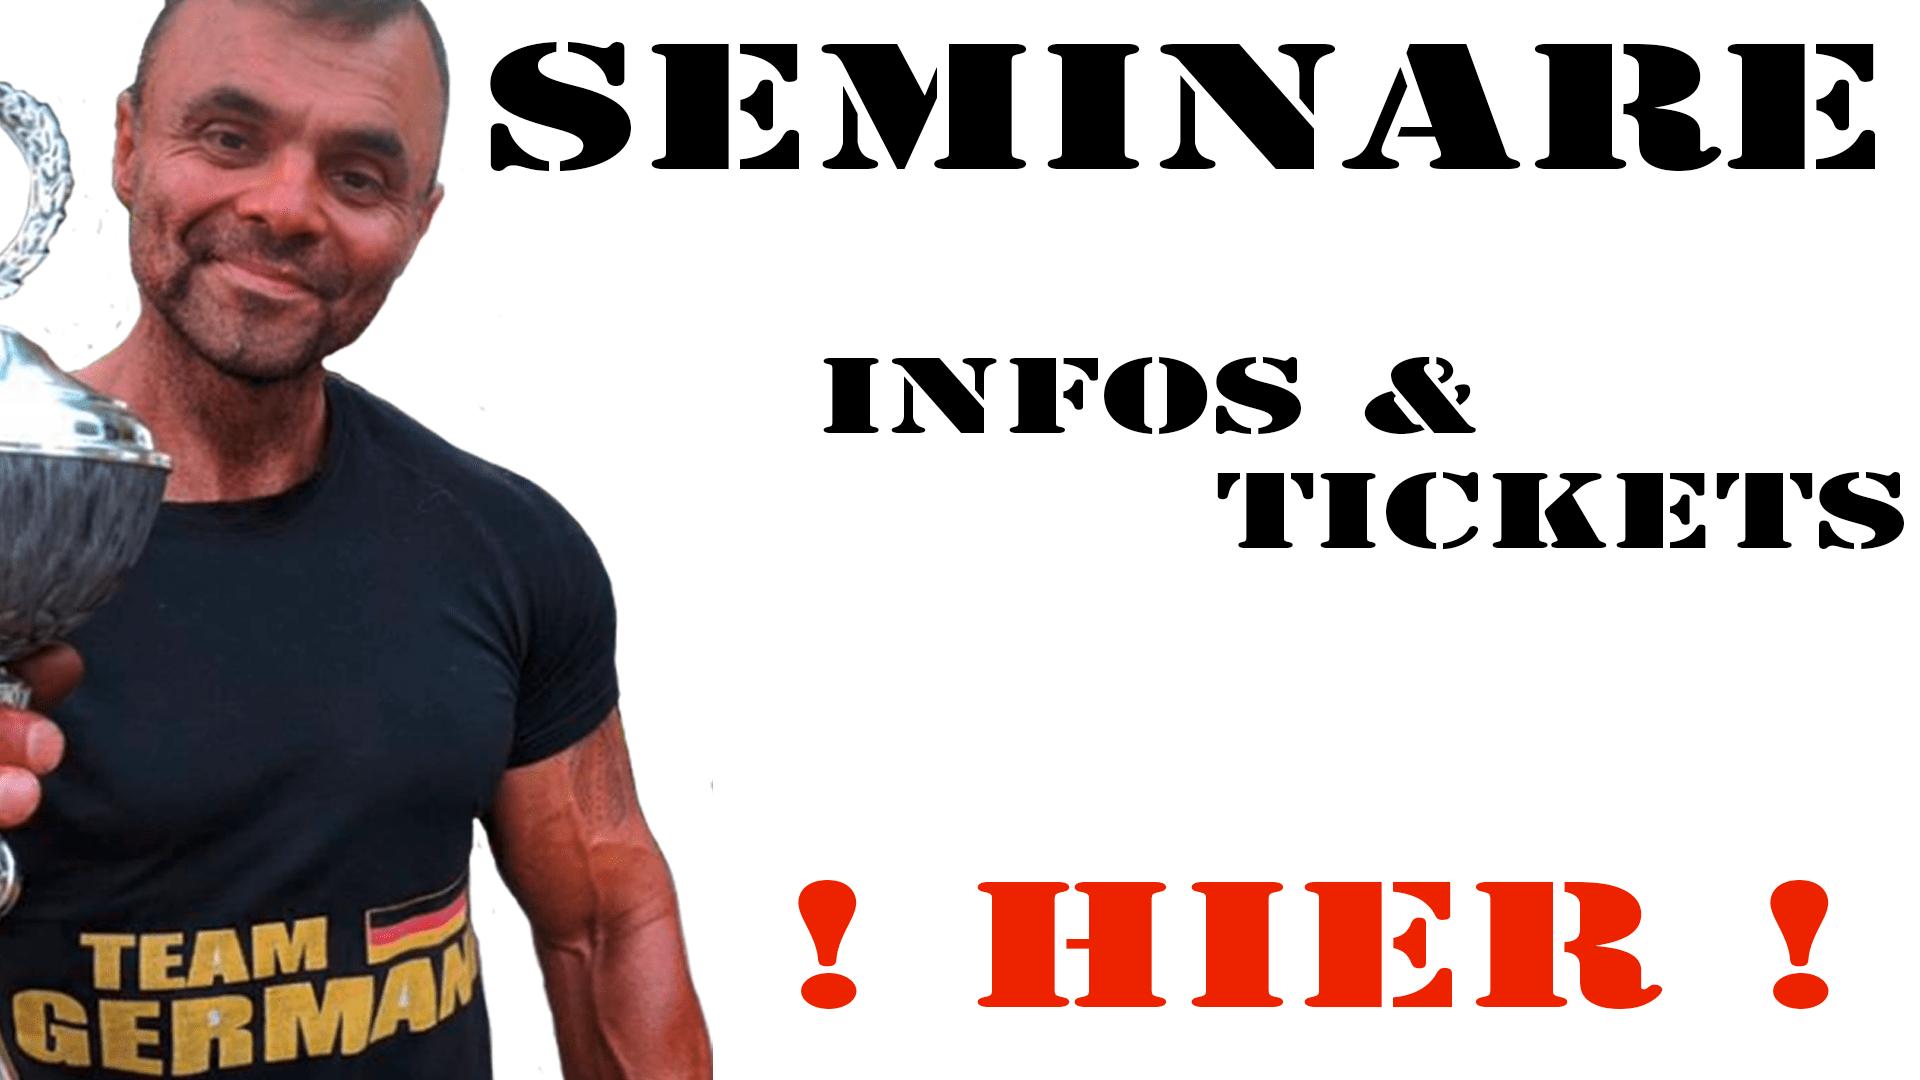 SEMINARE - Infos-&-Tickets